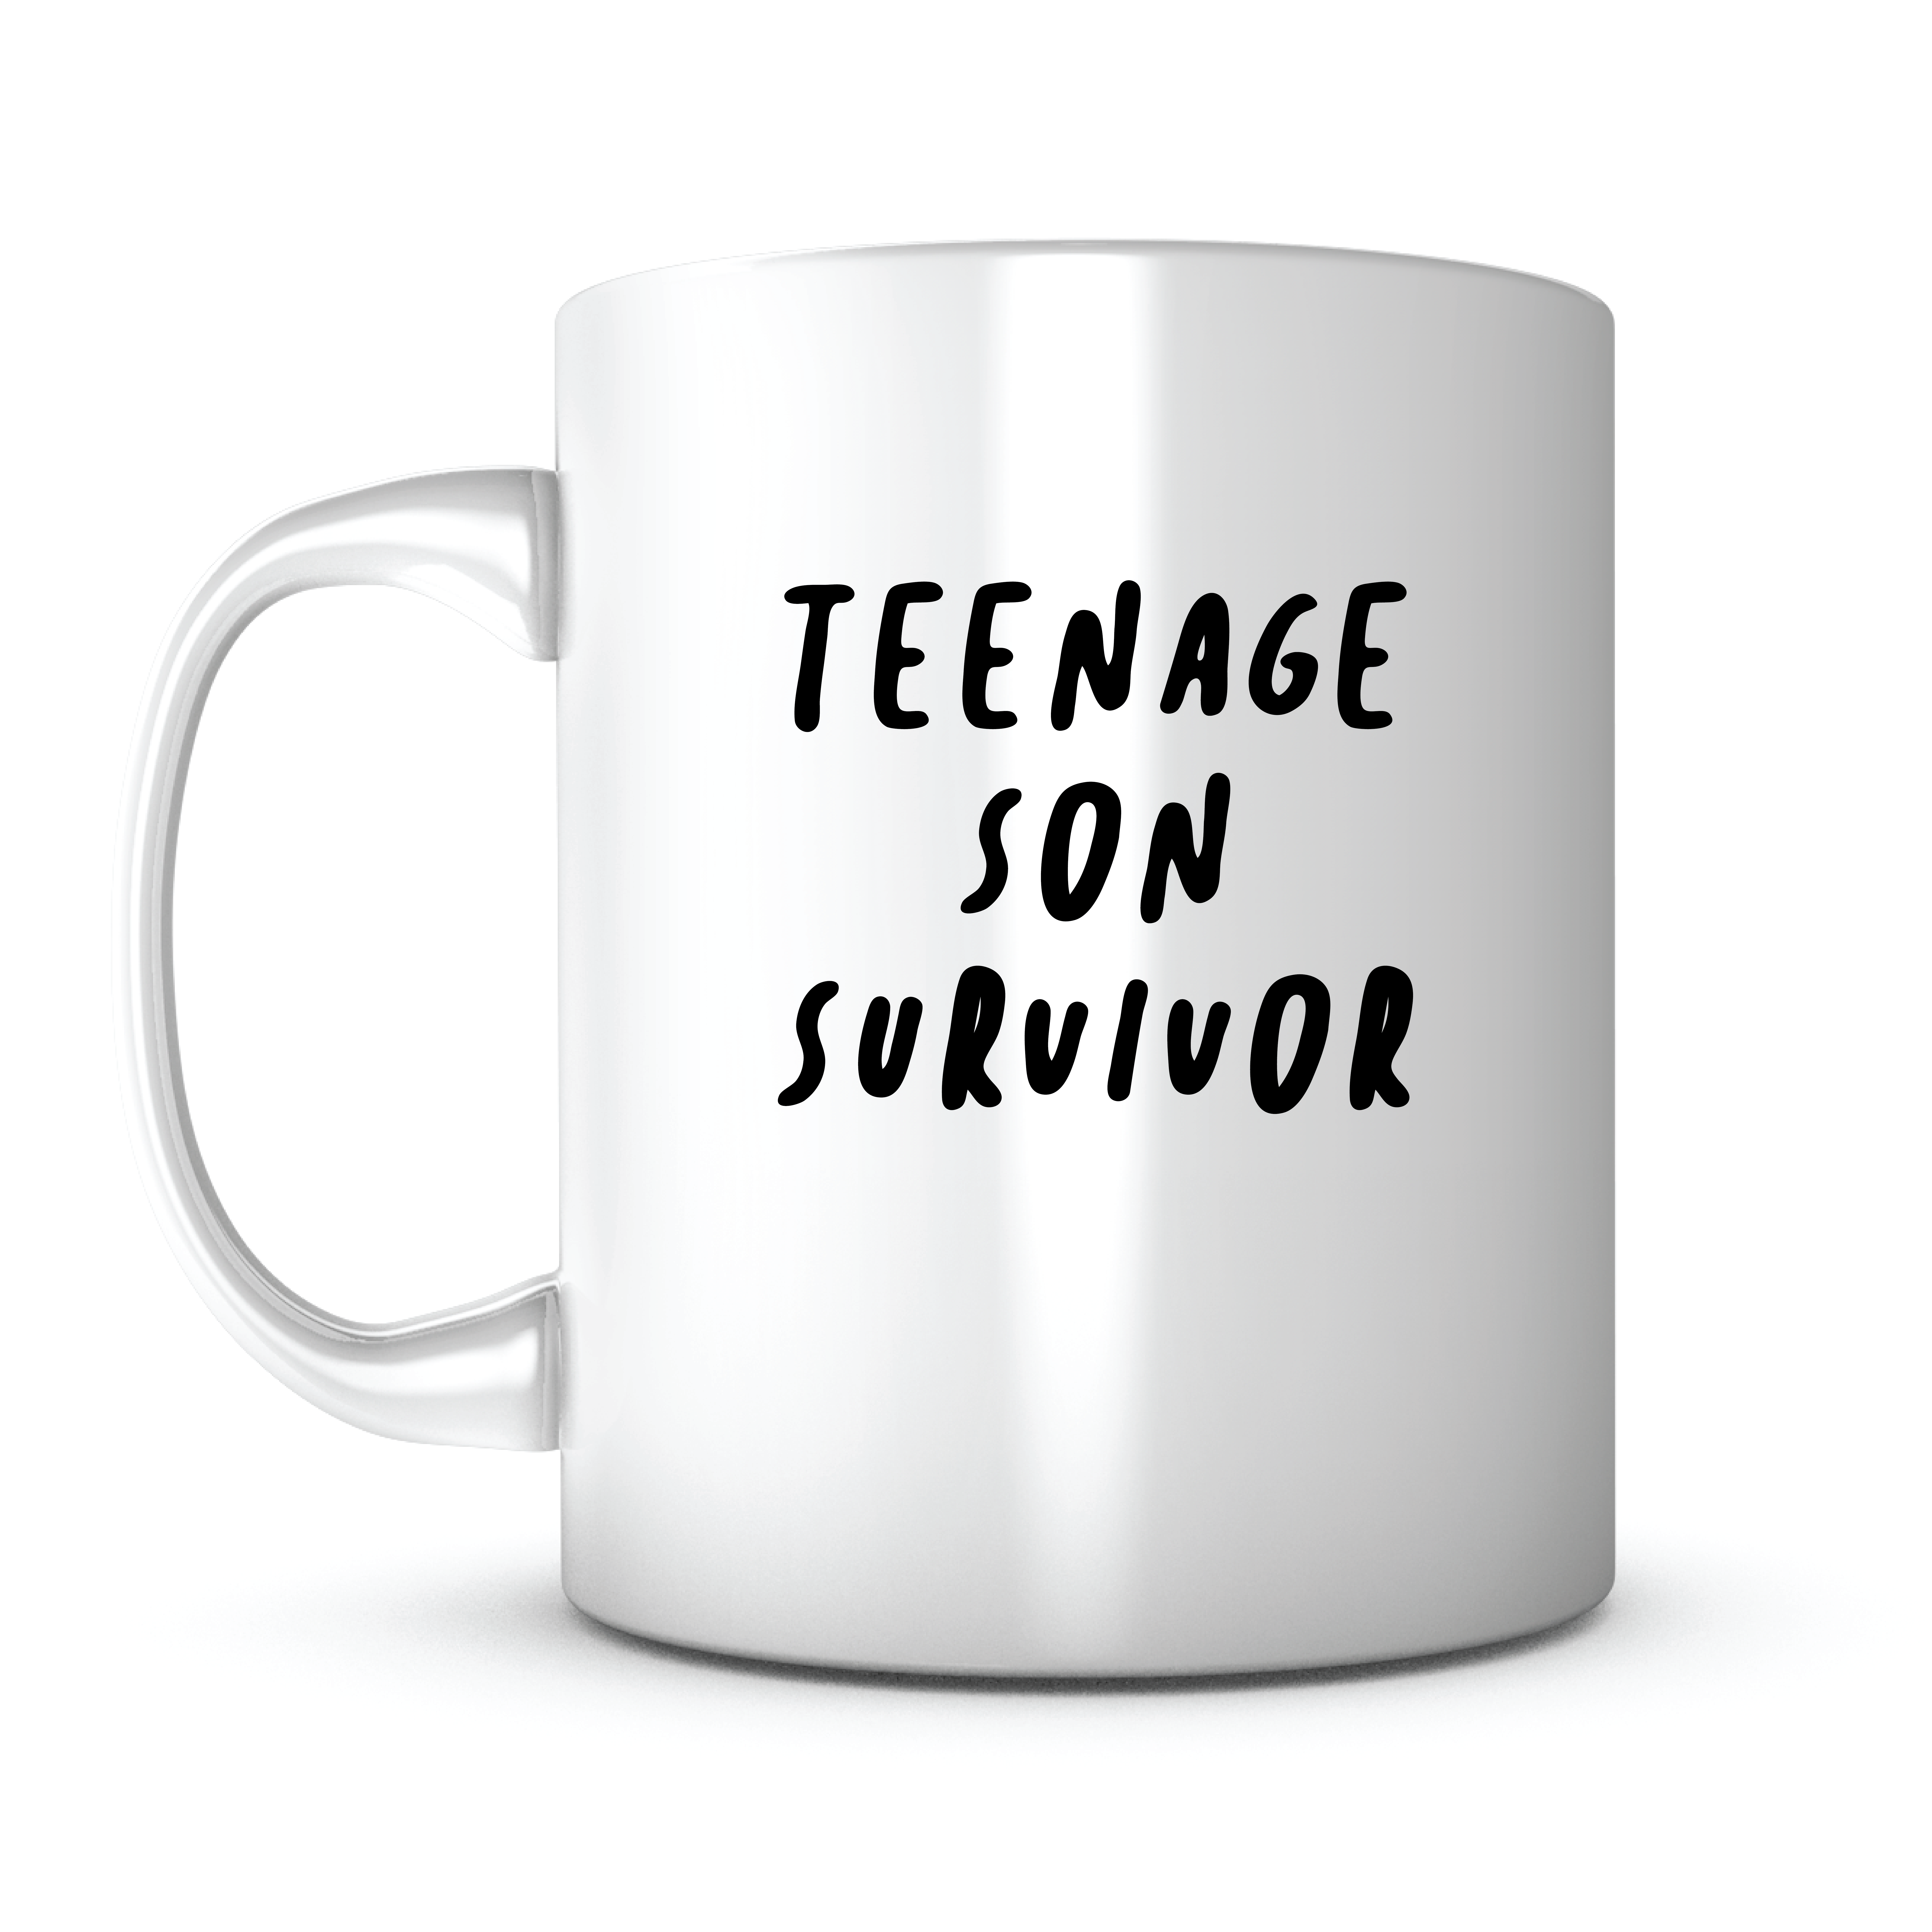 """Teenage Son Survivor"" Mug"